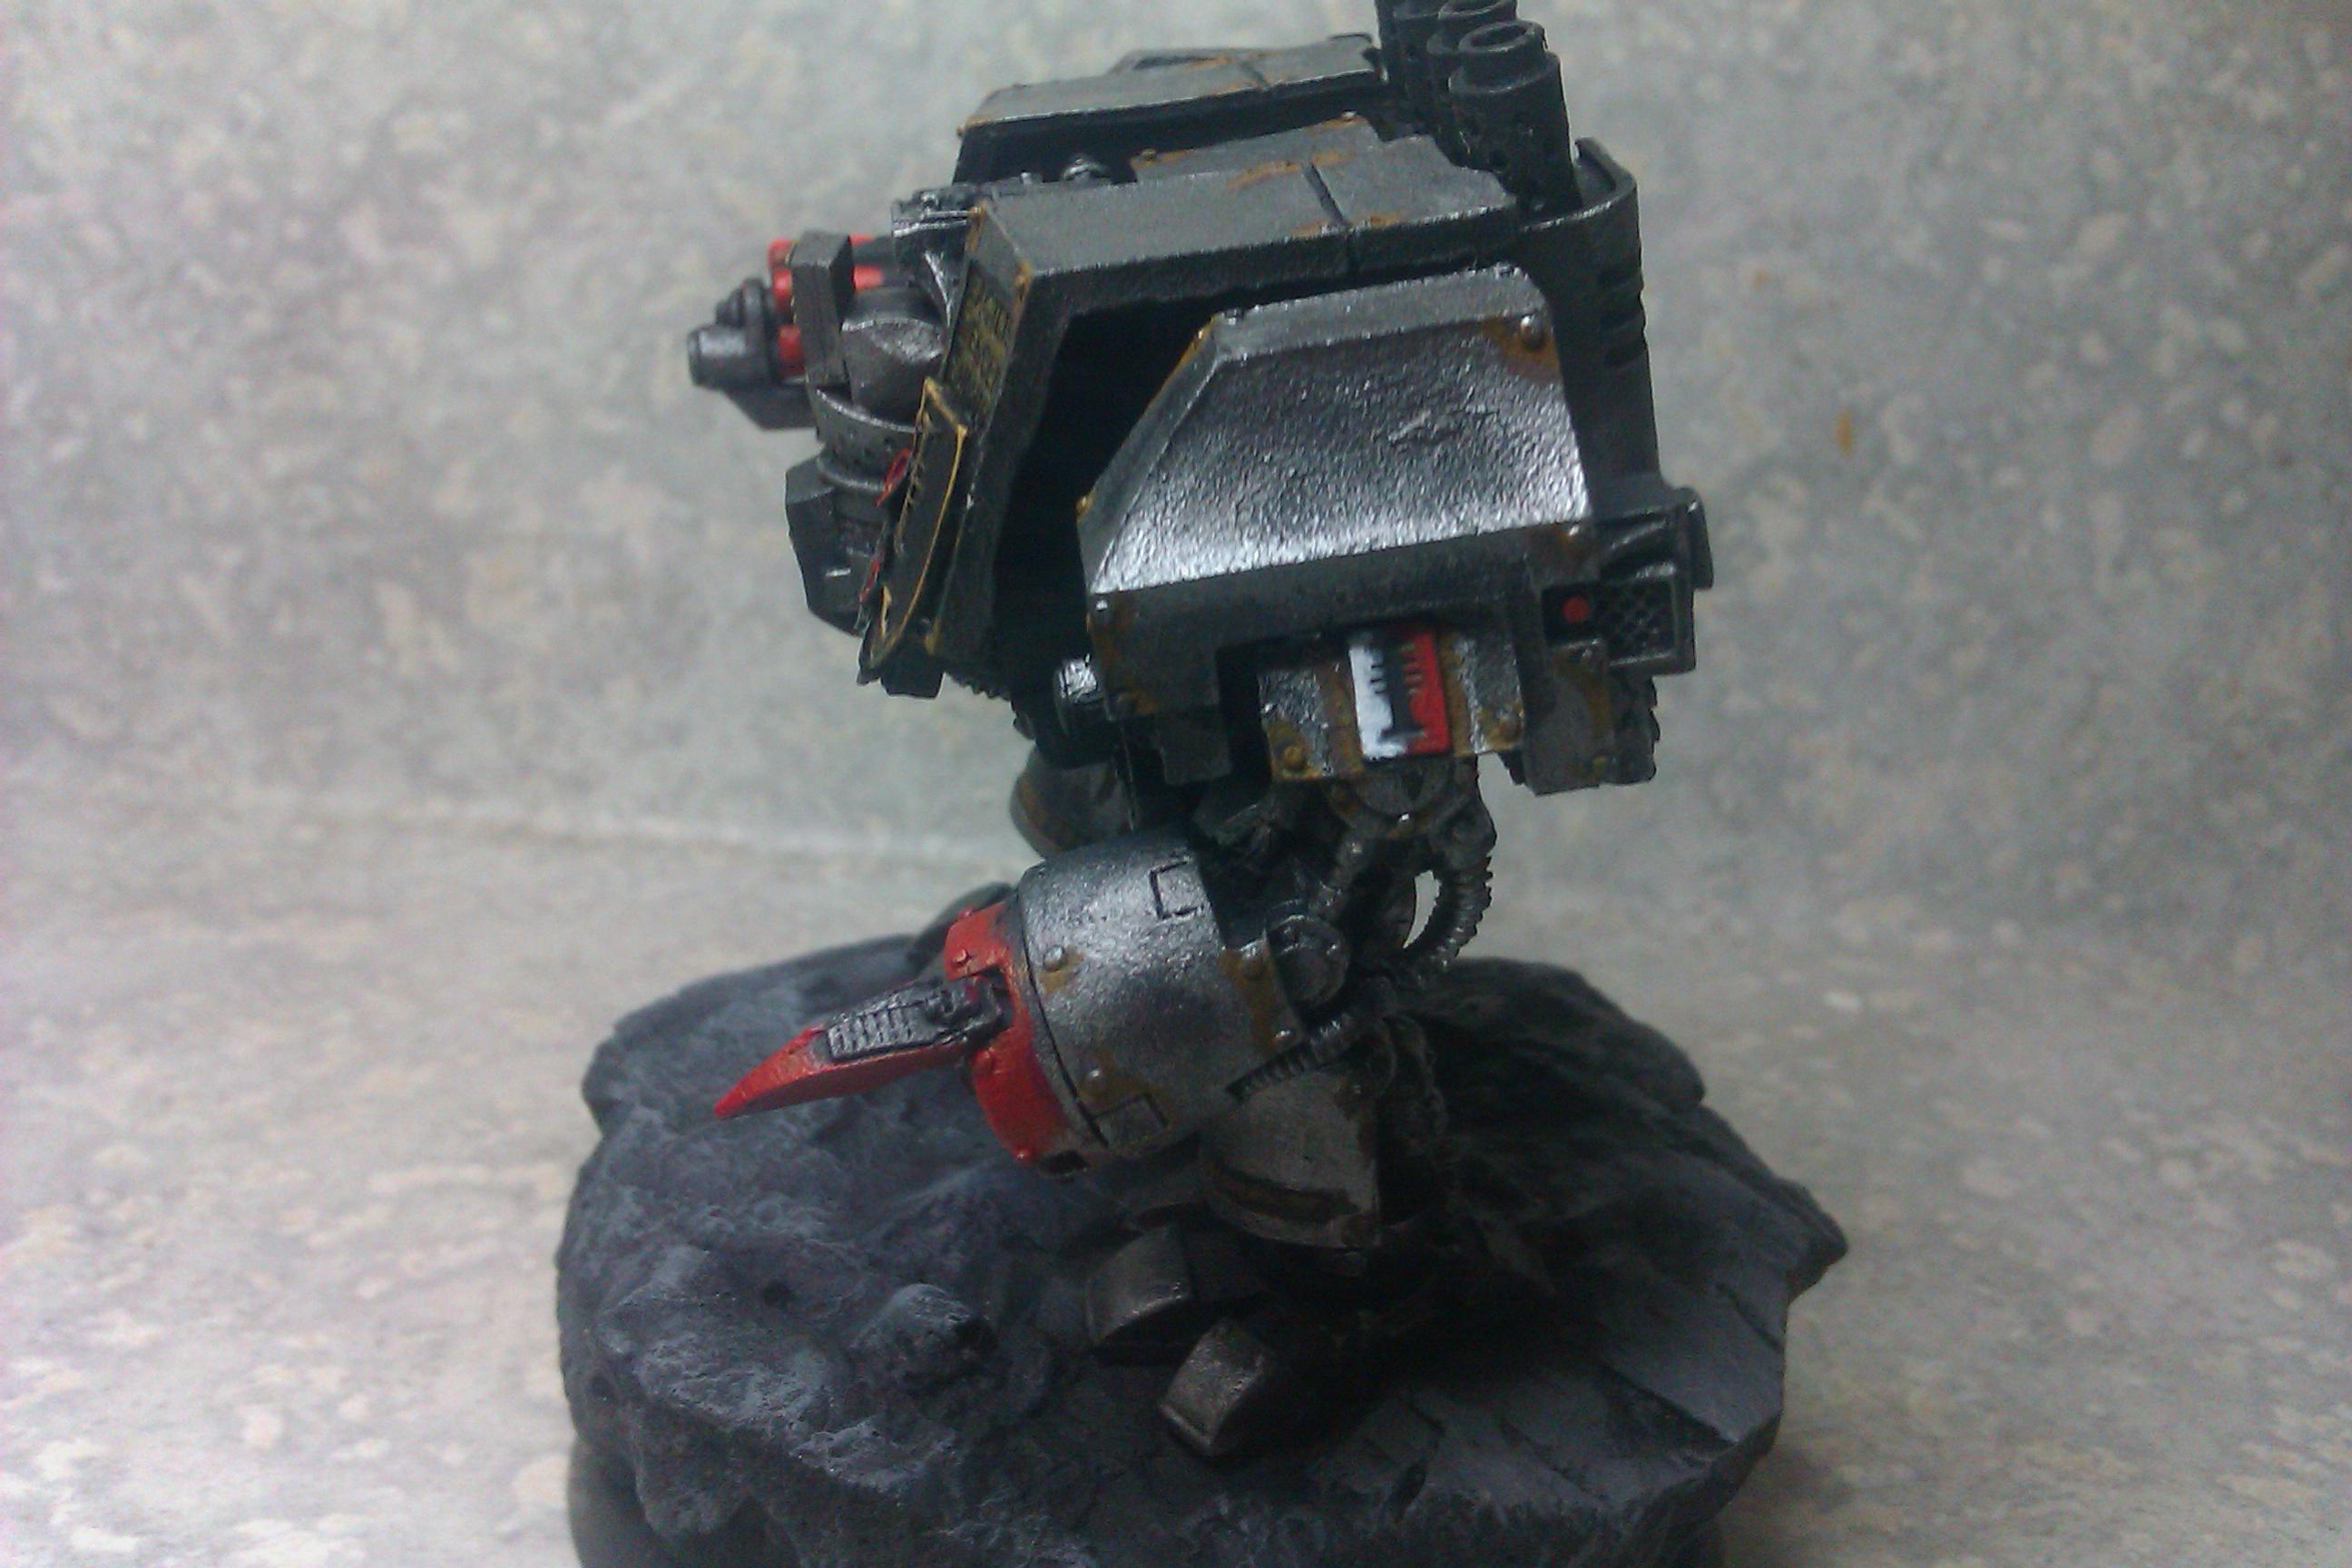 Dreadnought, Grey Knights, Space Marines, Warhammer 40,000